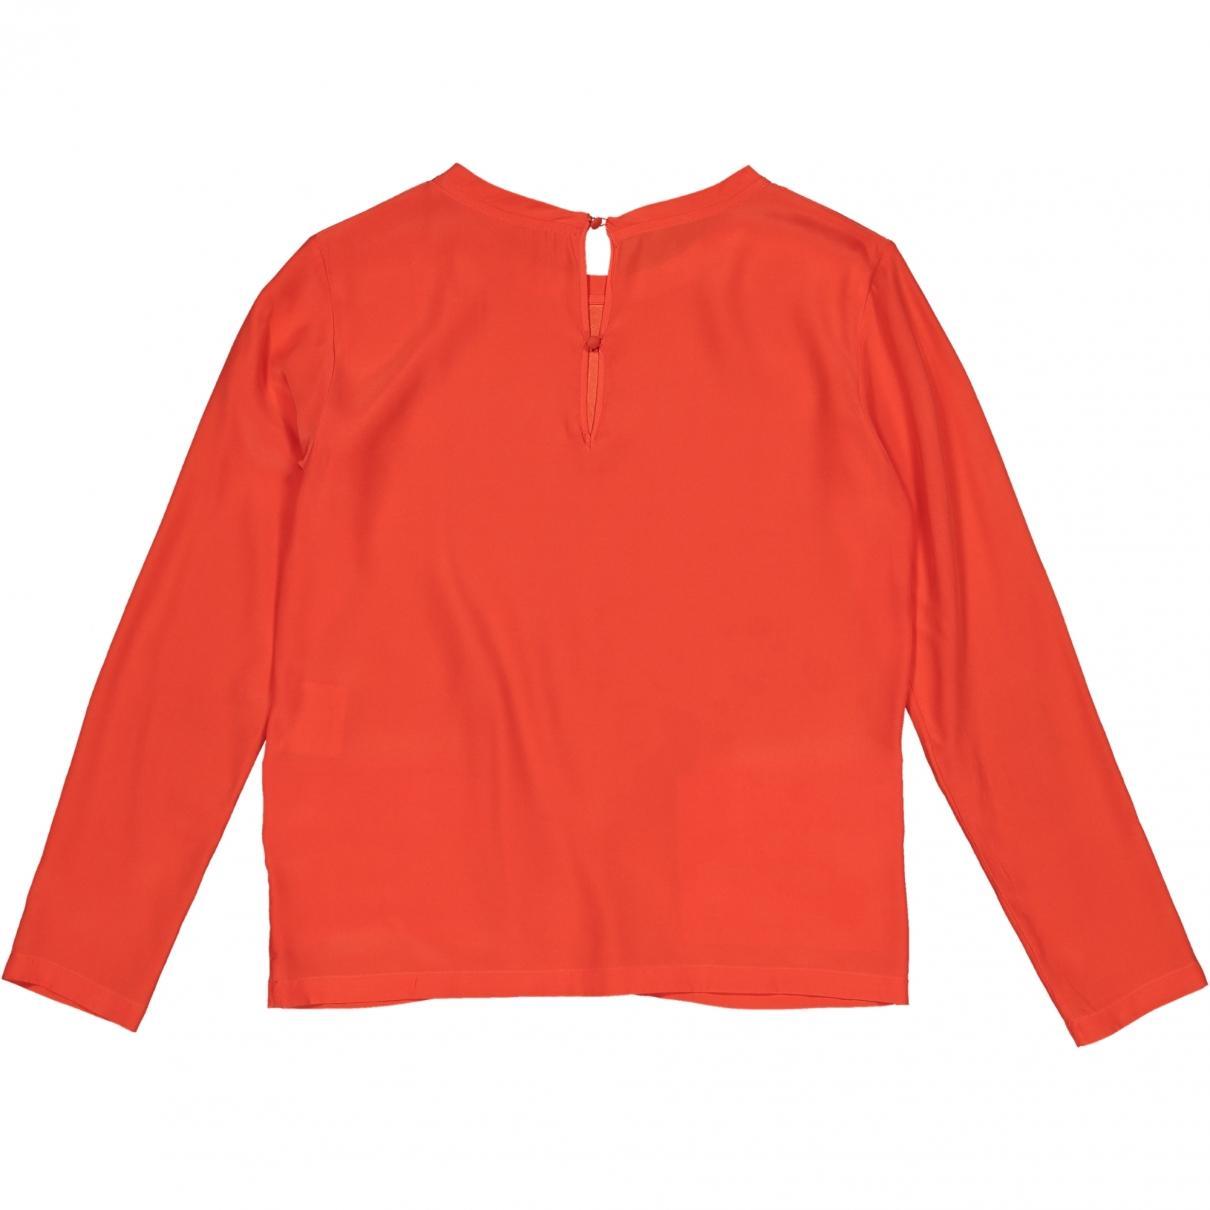 Blusa de Seda Golden Goose Deluxe Brand de Seda de color Naranja